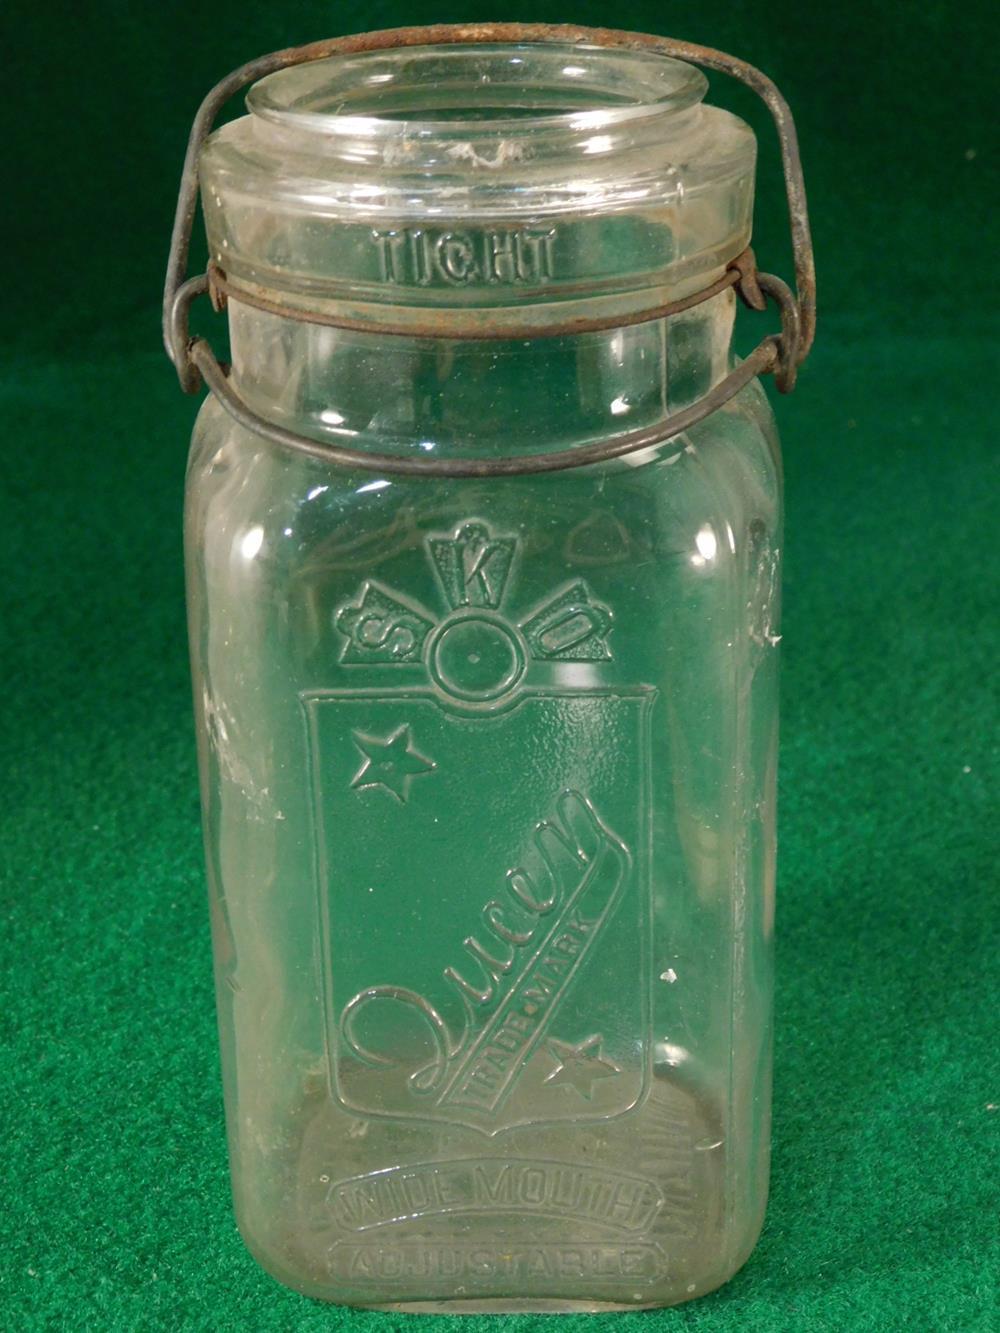 VINTAGE ANTIQUE GLASS JAR ANTIQUES AND COLLECTIBLES